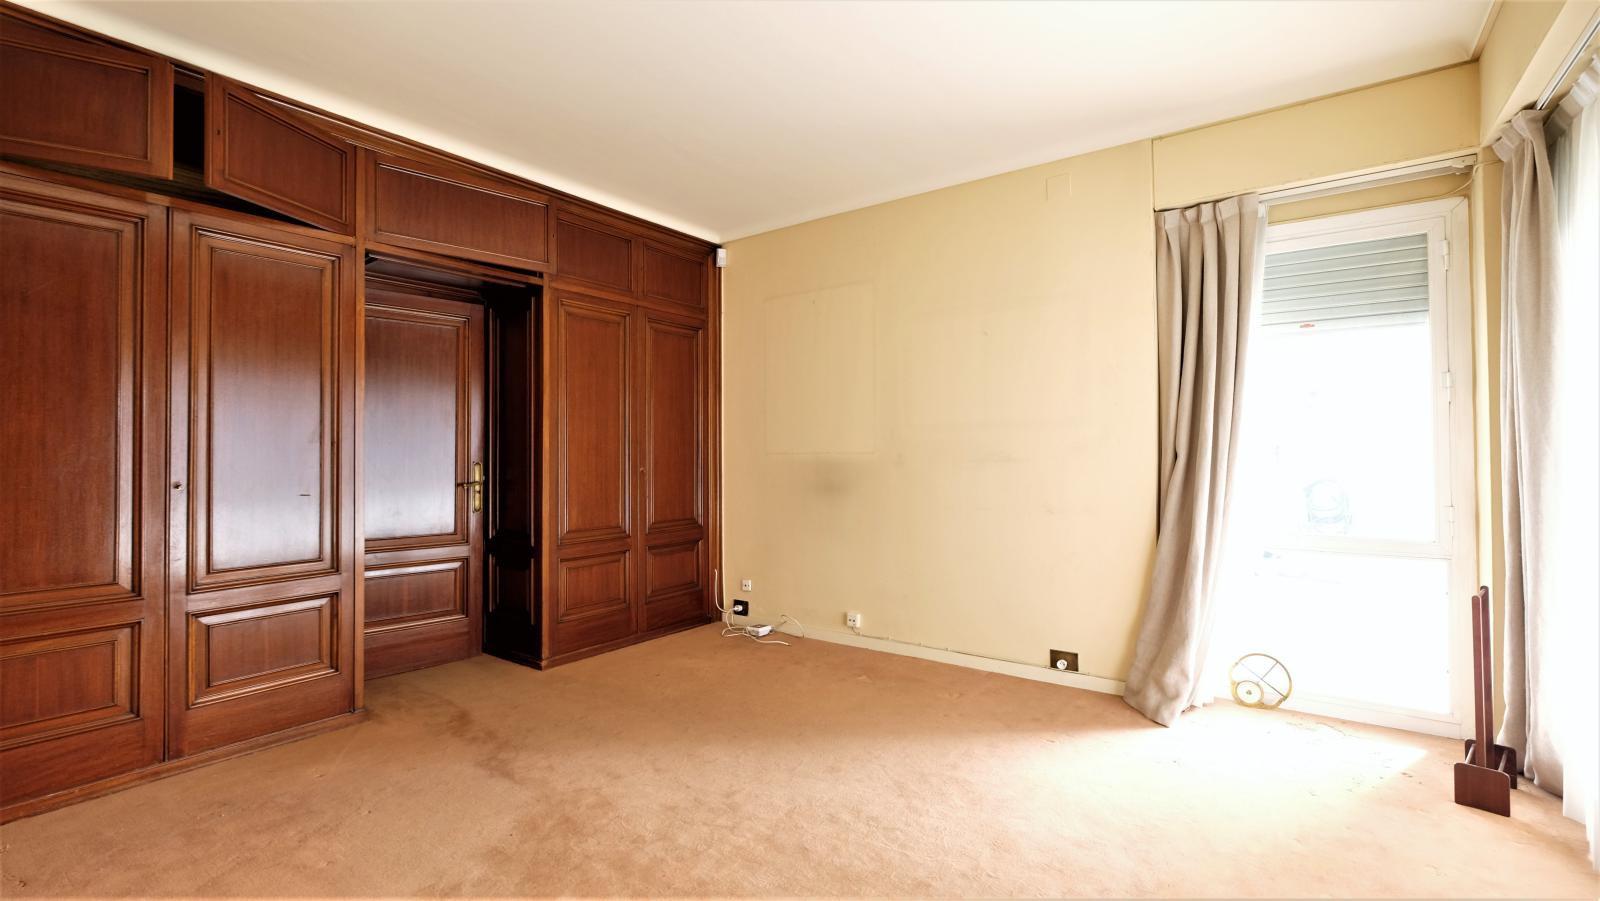 MG Inmobiliaria Barcelona - via-augusta-tres-torres-ganduxer-1289